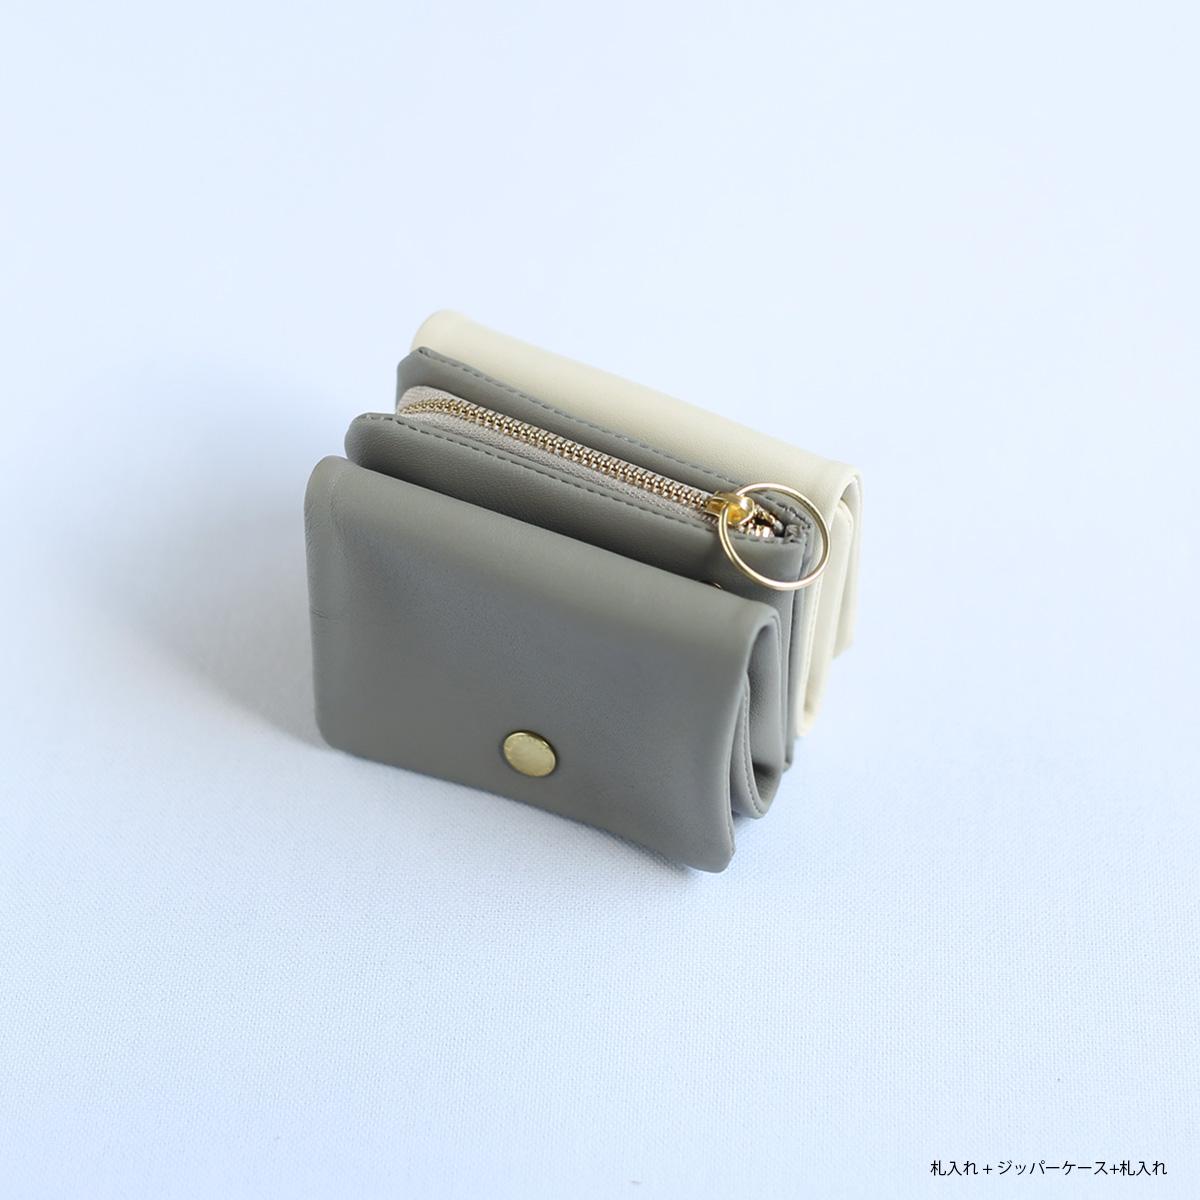 CINQ スナップユニット財布/ジッパーケース/サンク